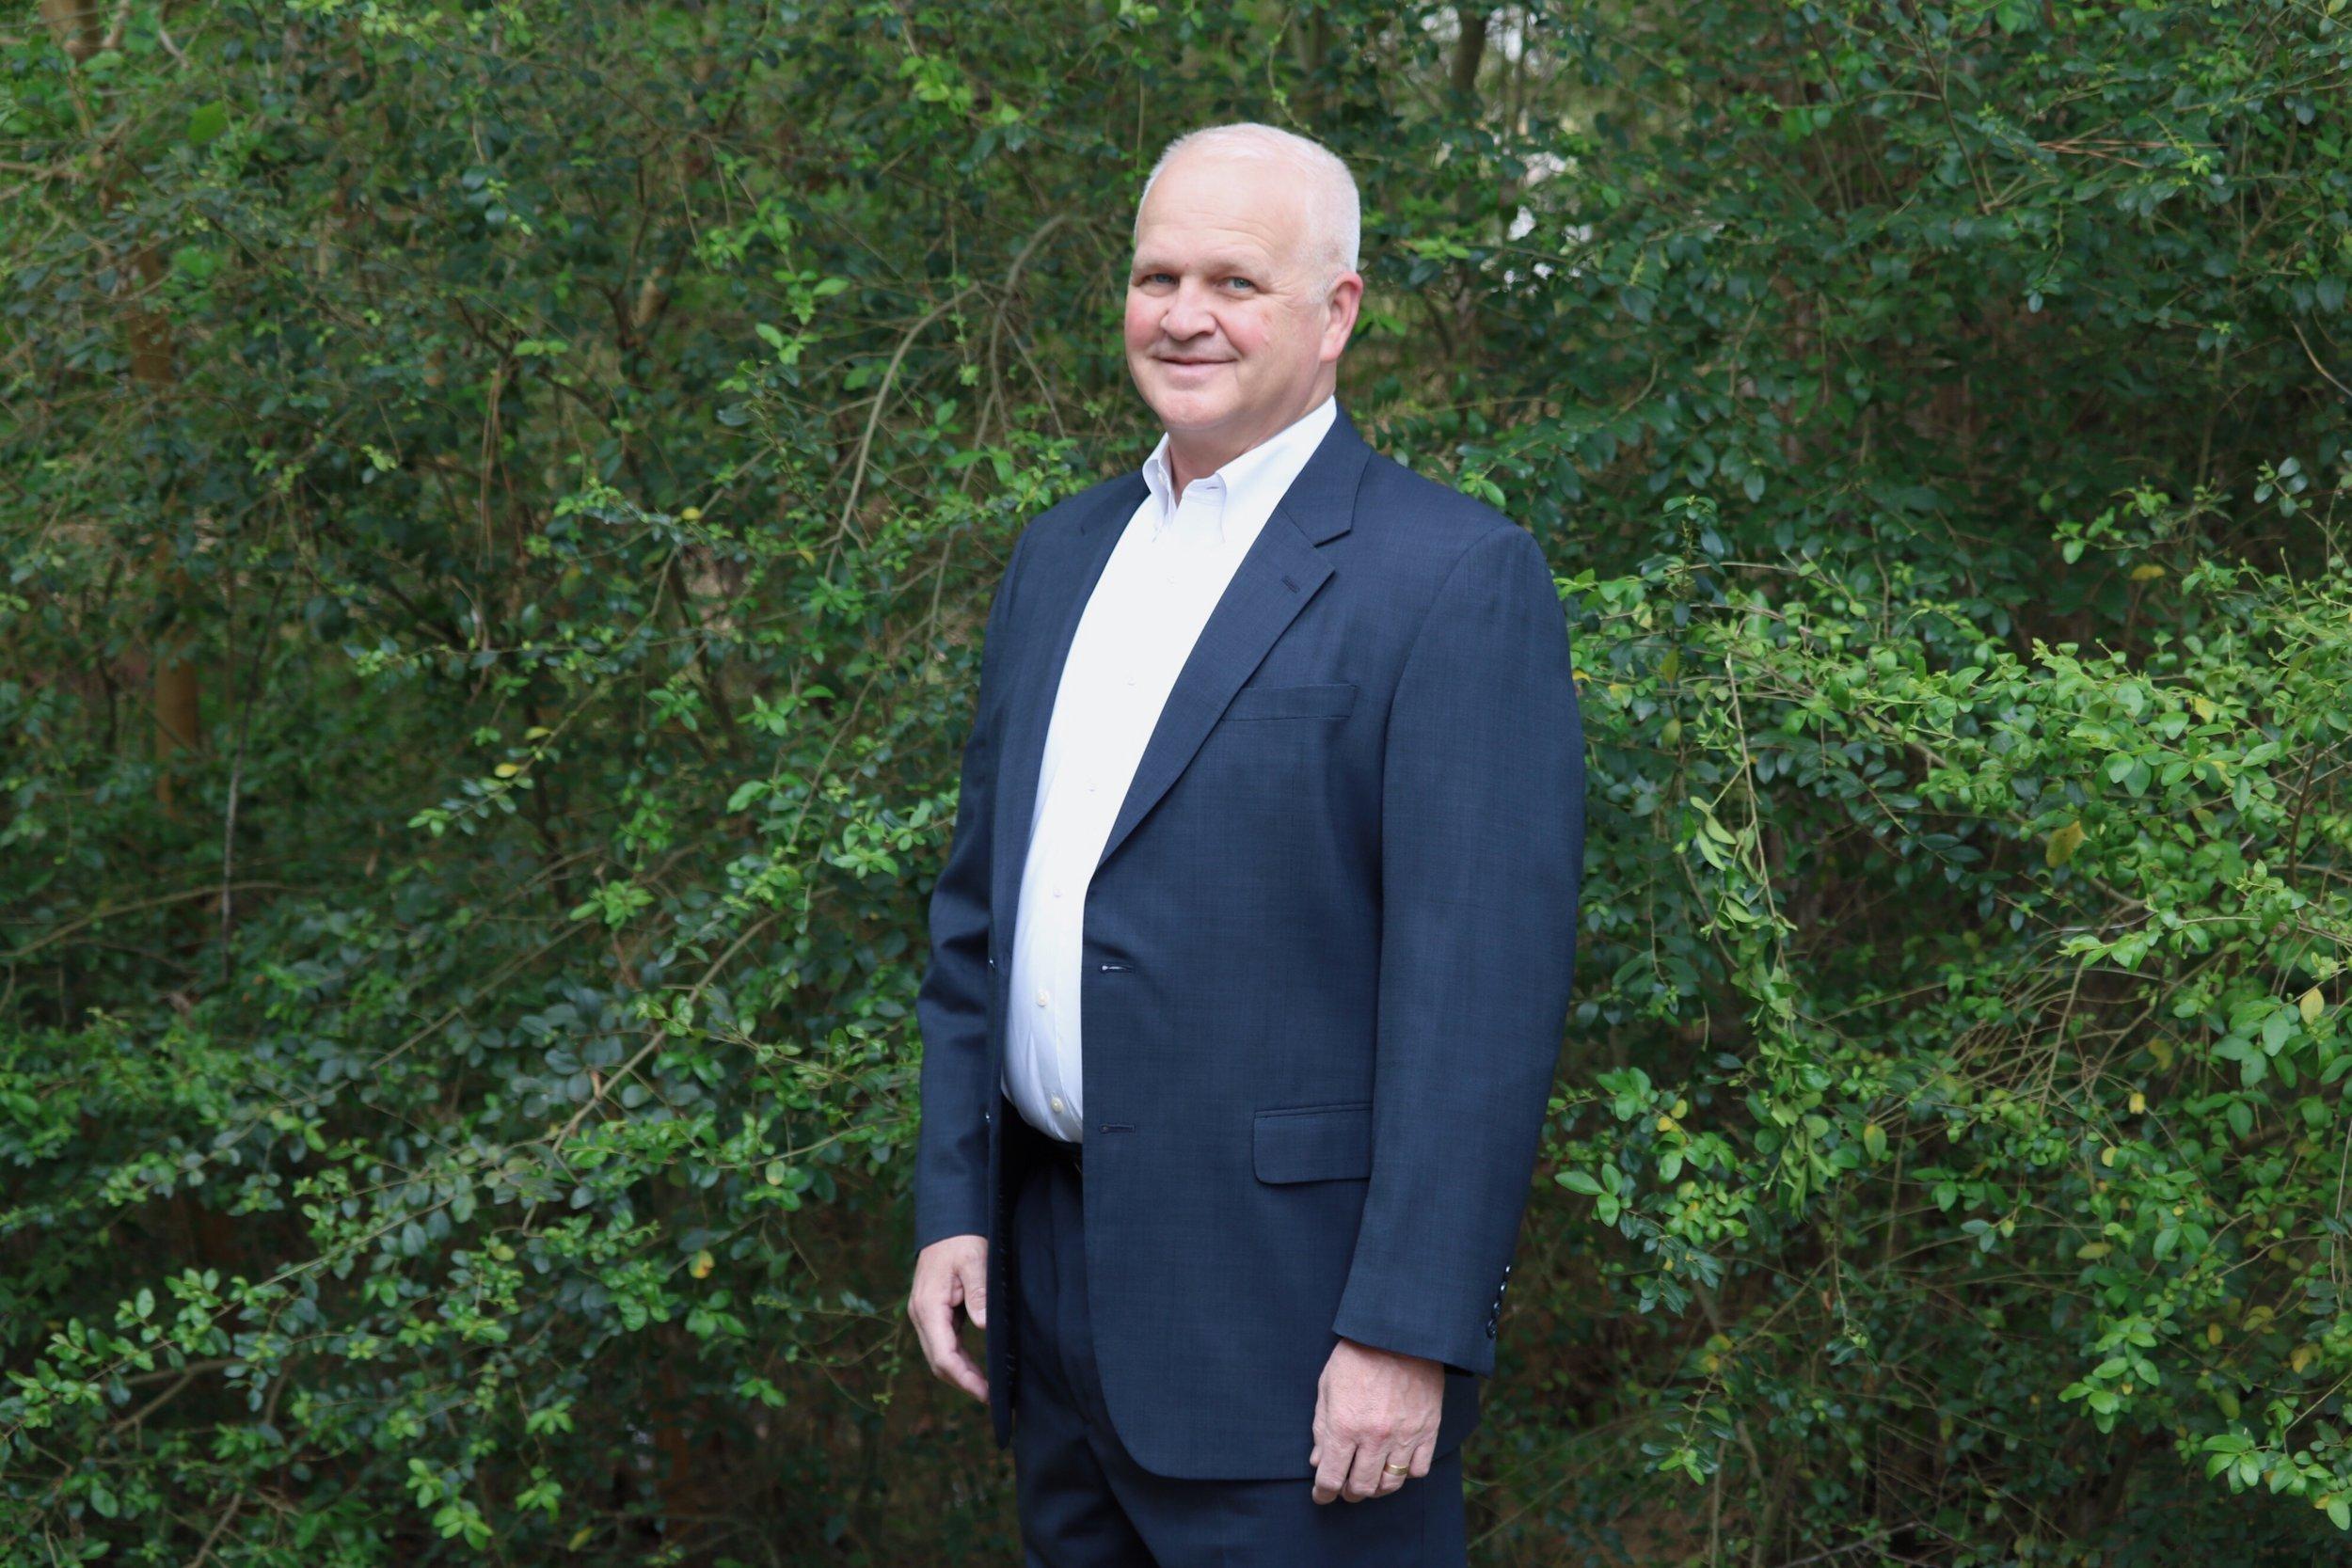 Keven Wilberding, Vice President